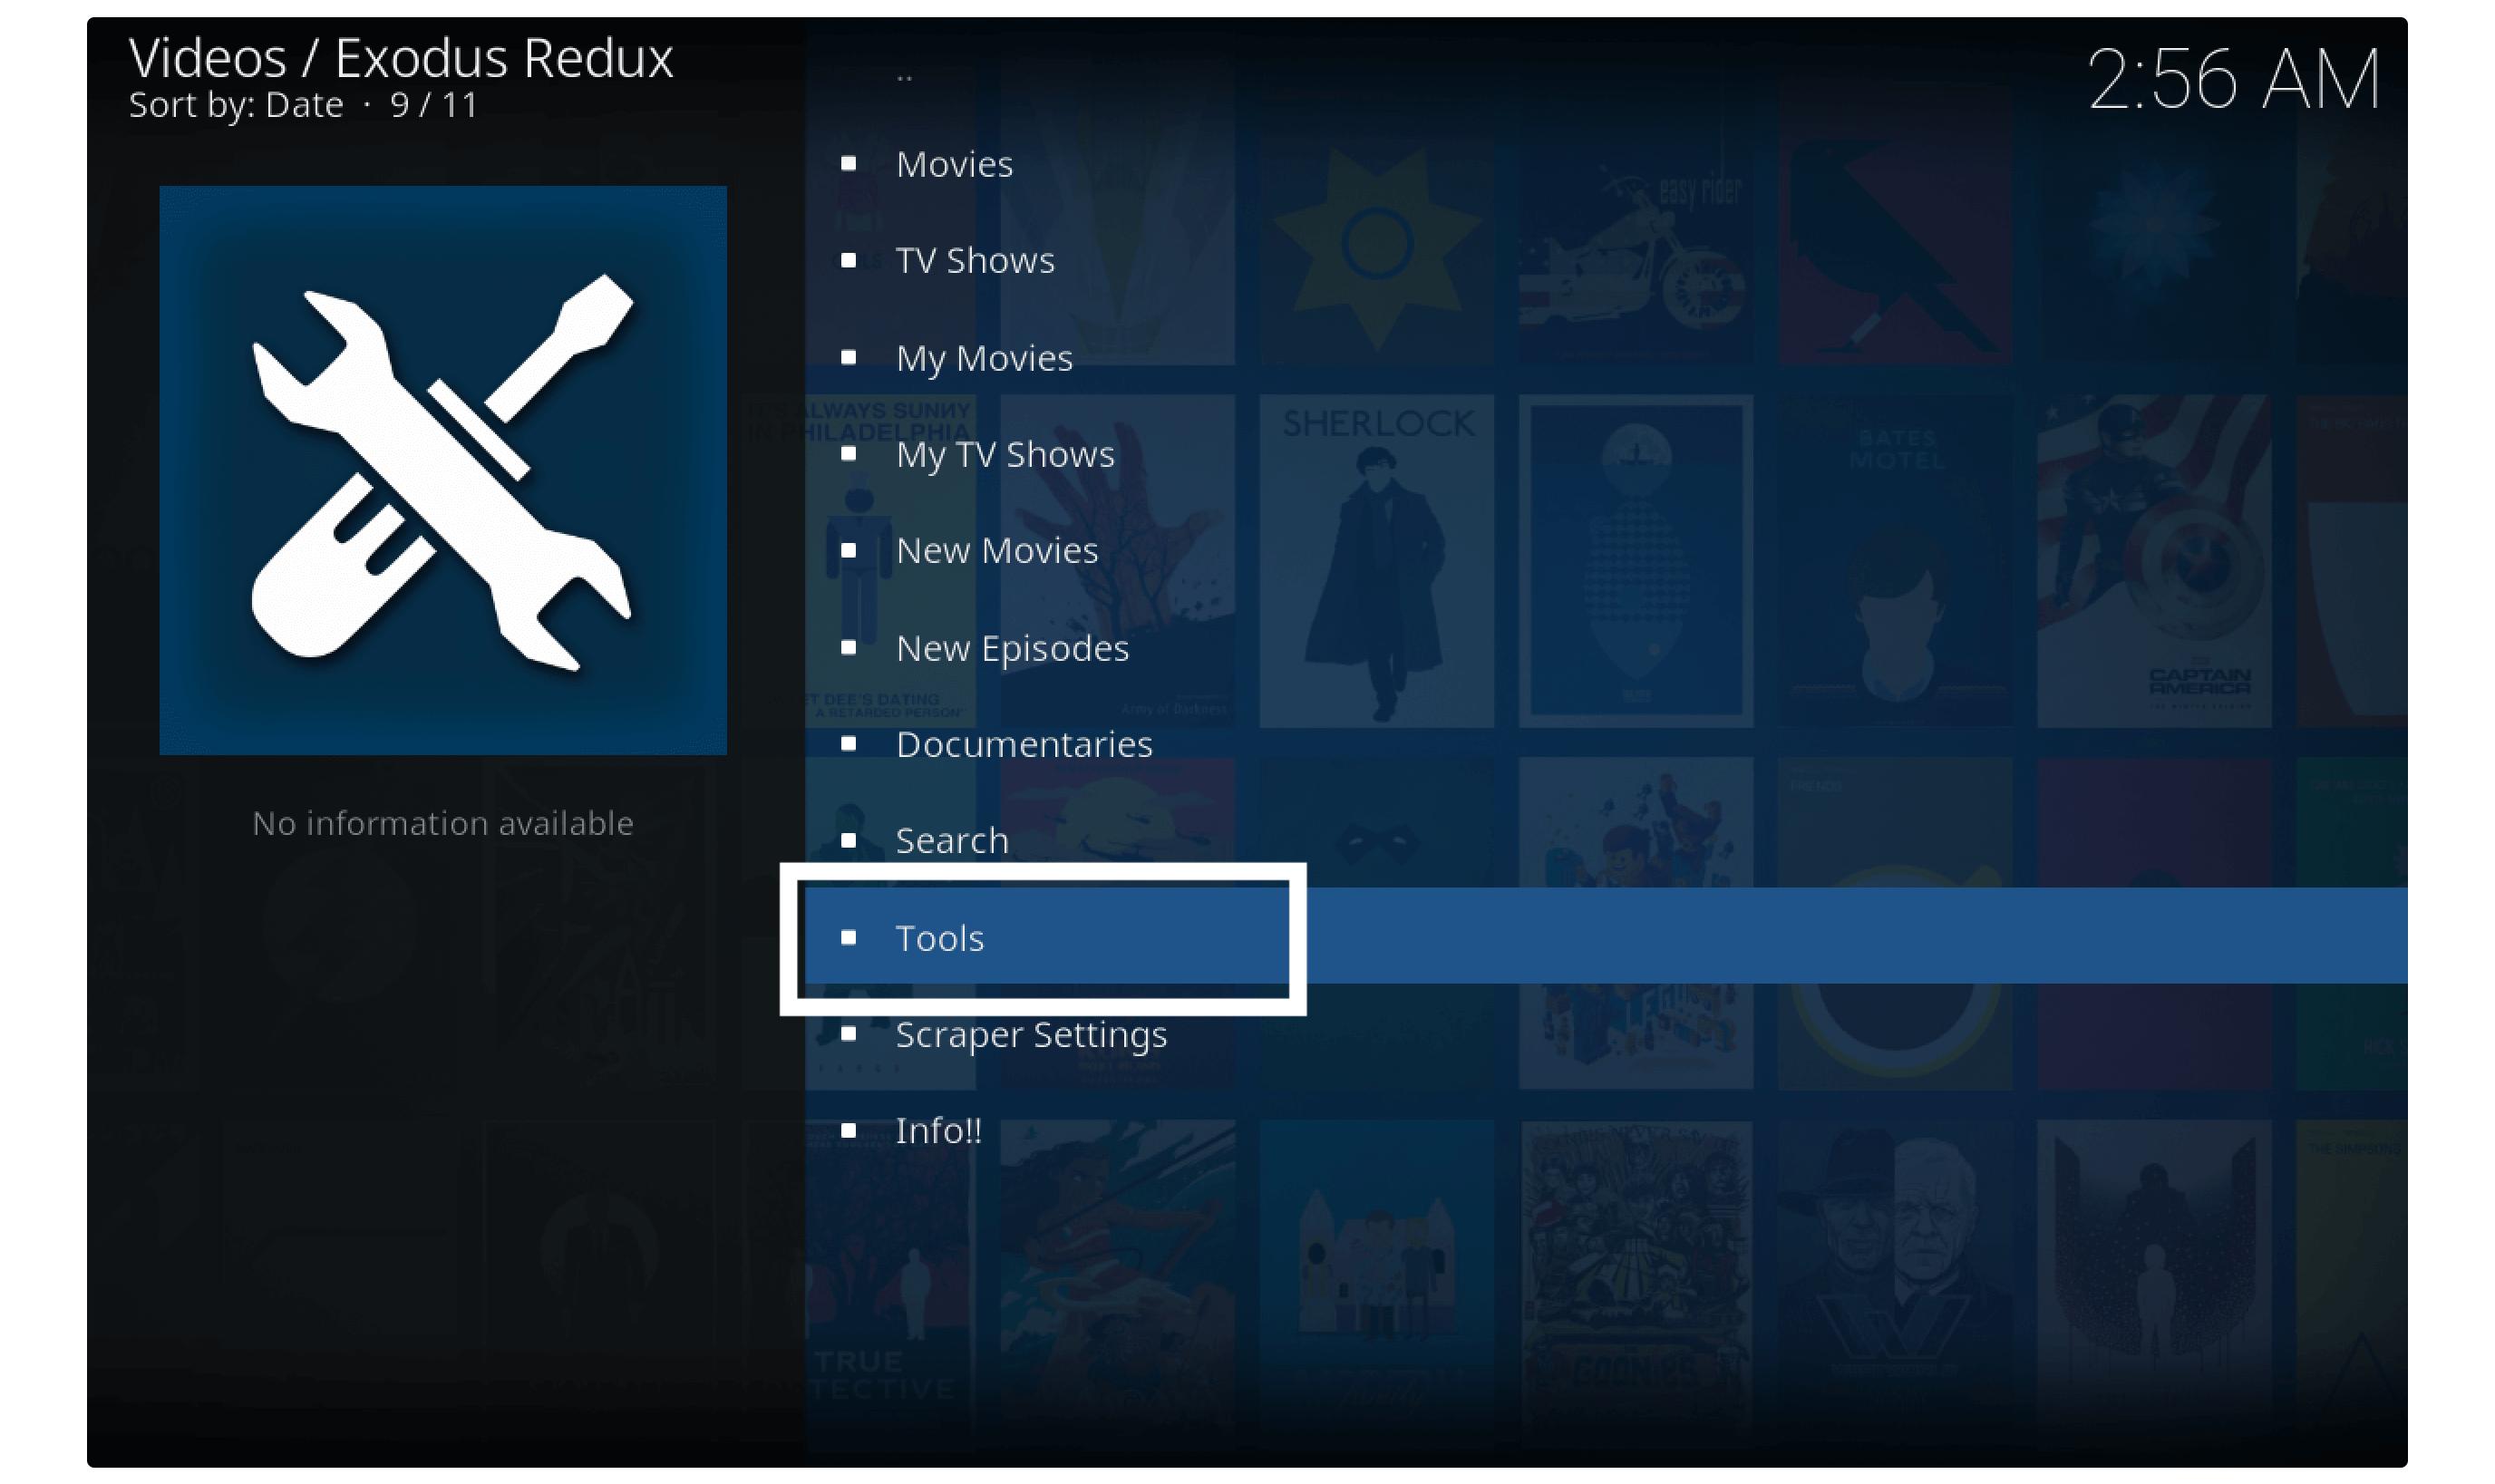 exodus-redux-no-stream-available-error